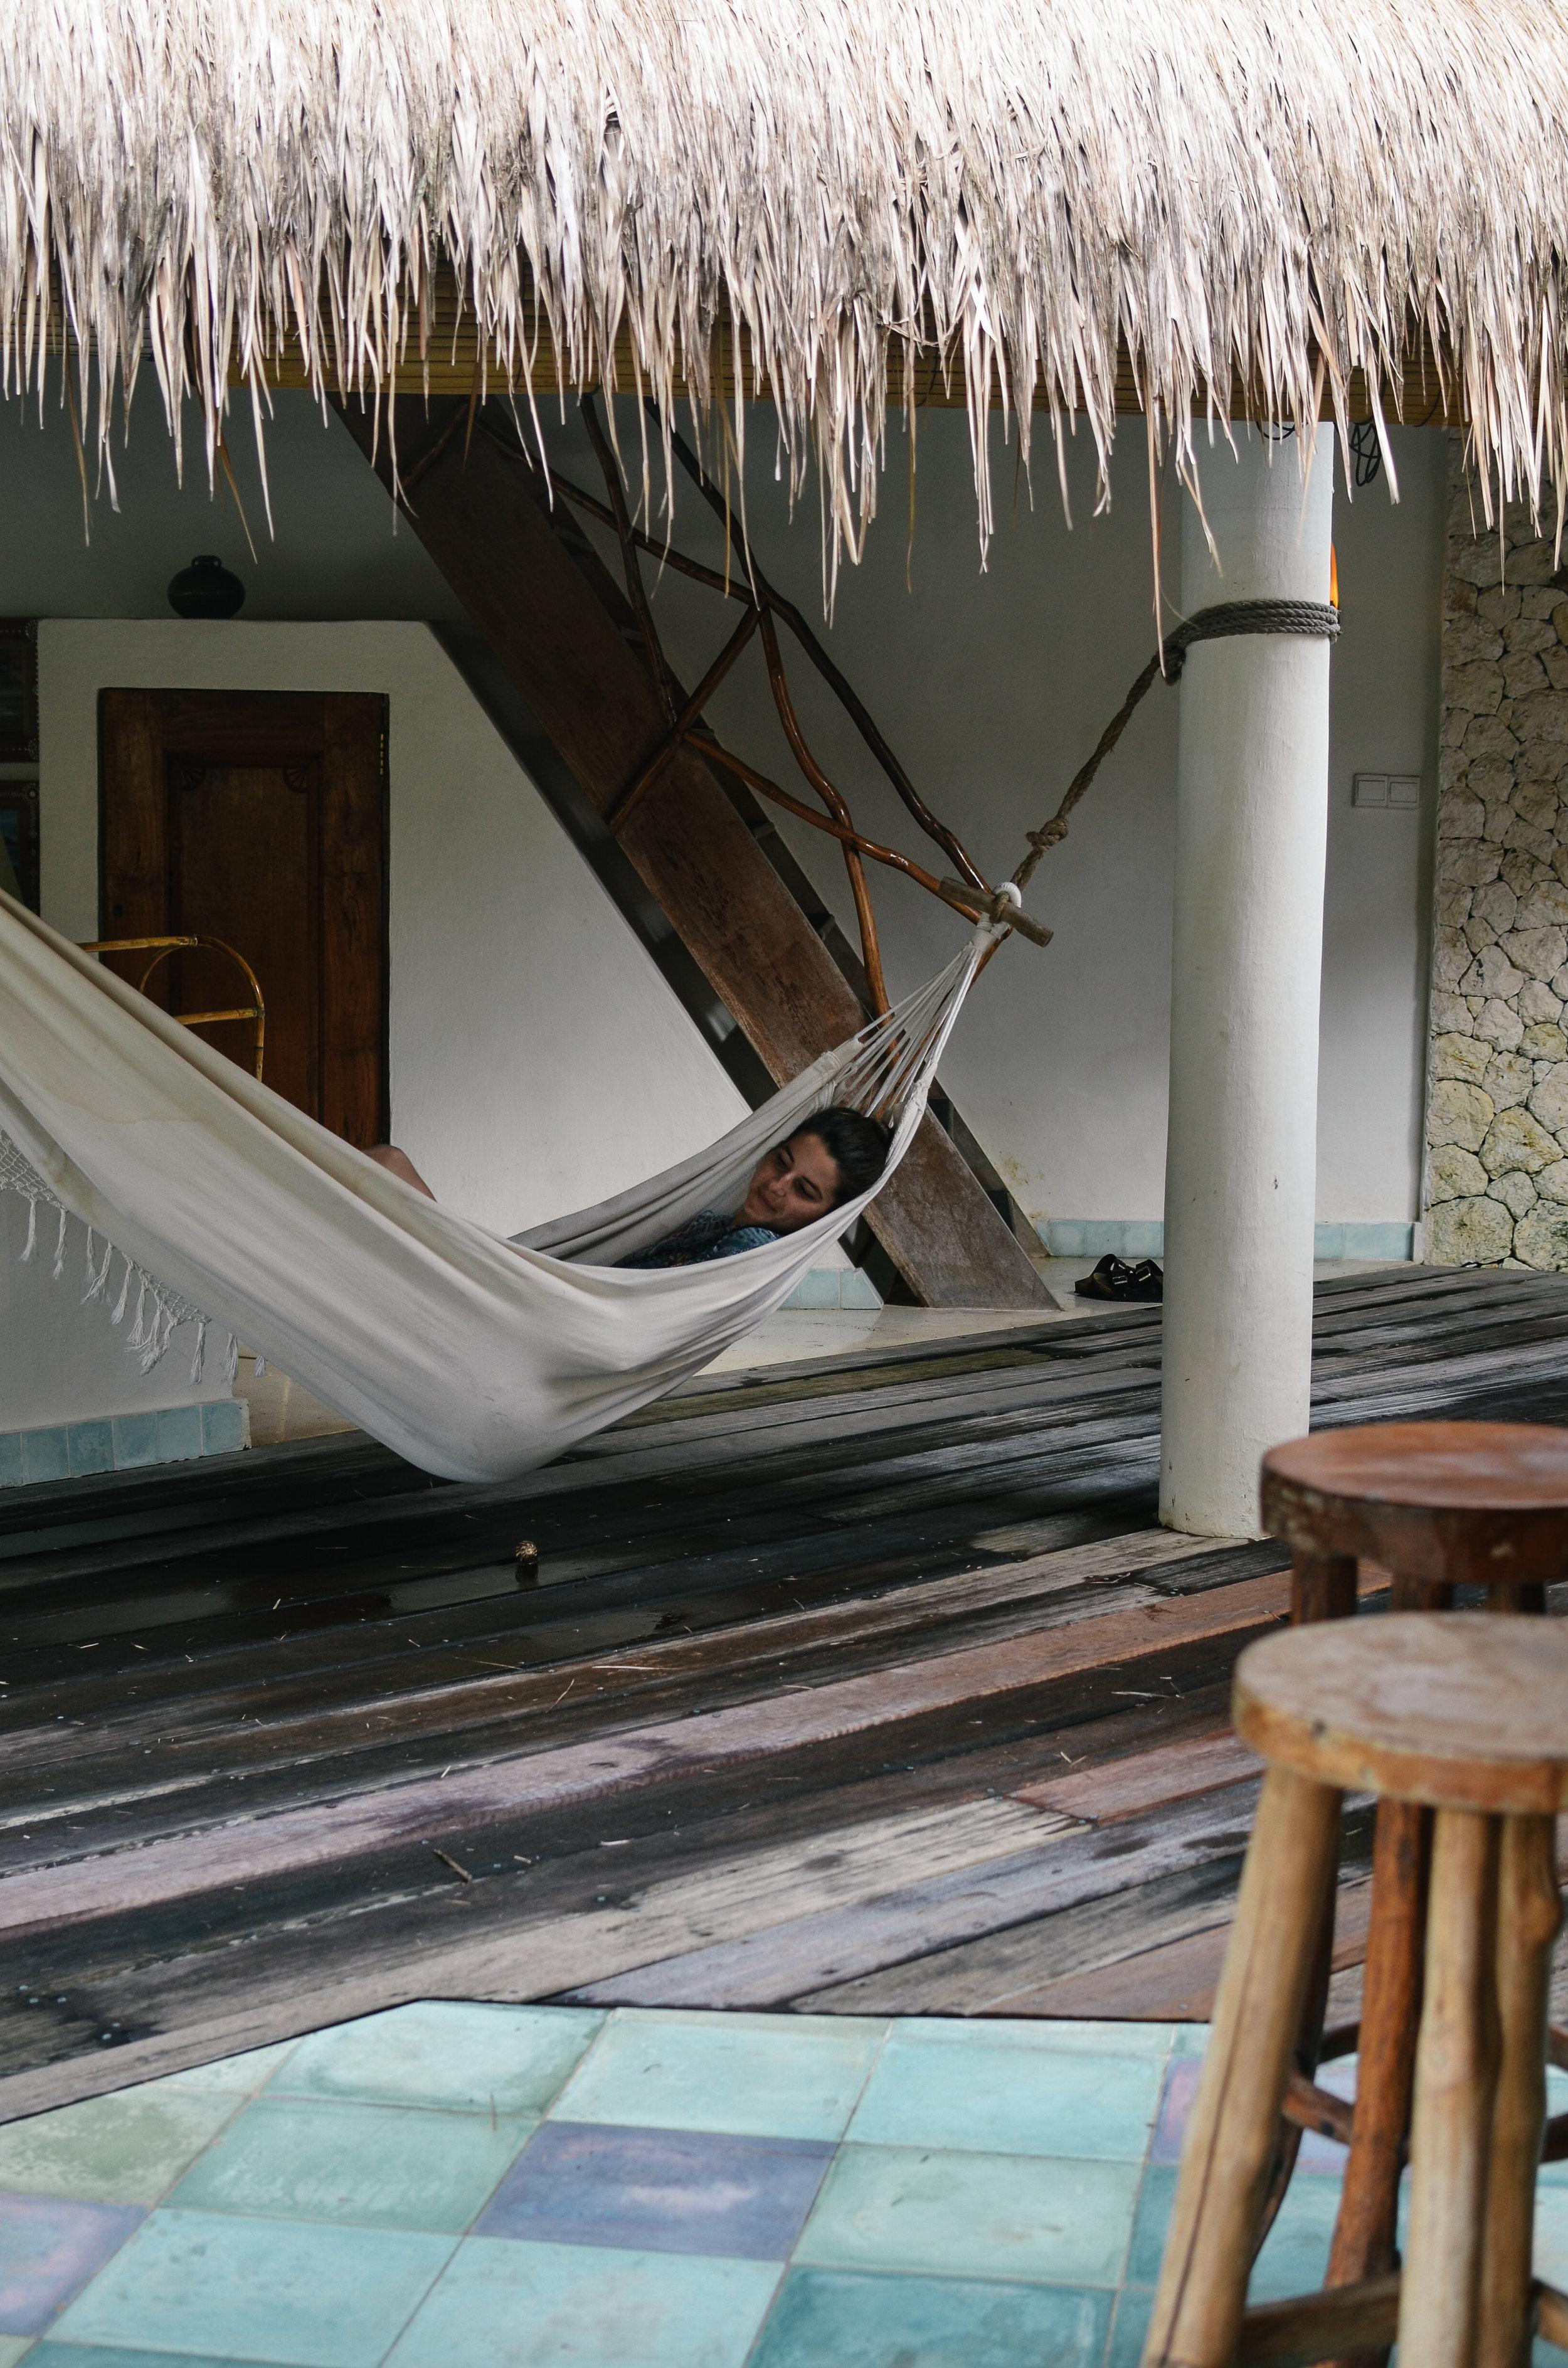 mu-villa-bali-boutique-hotel-lifeonpine_DSC_2101.jpg